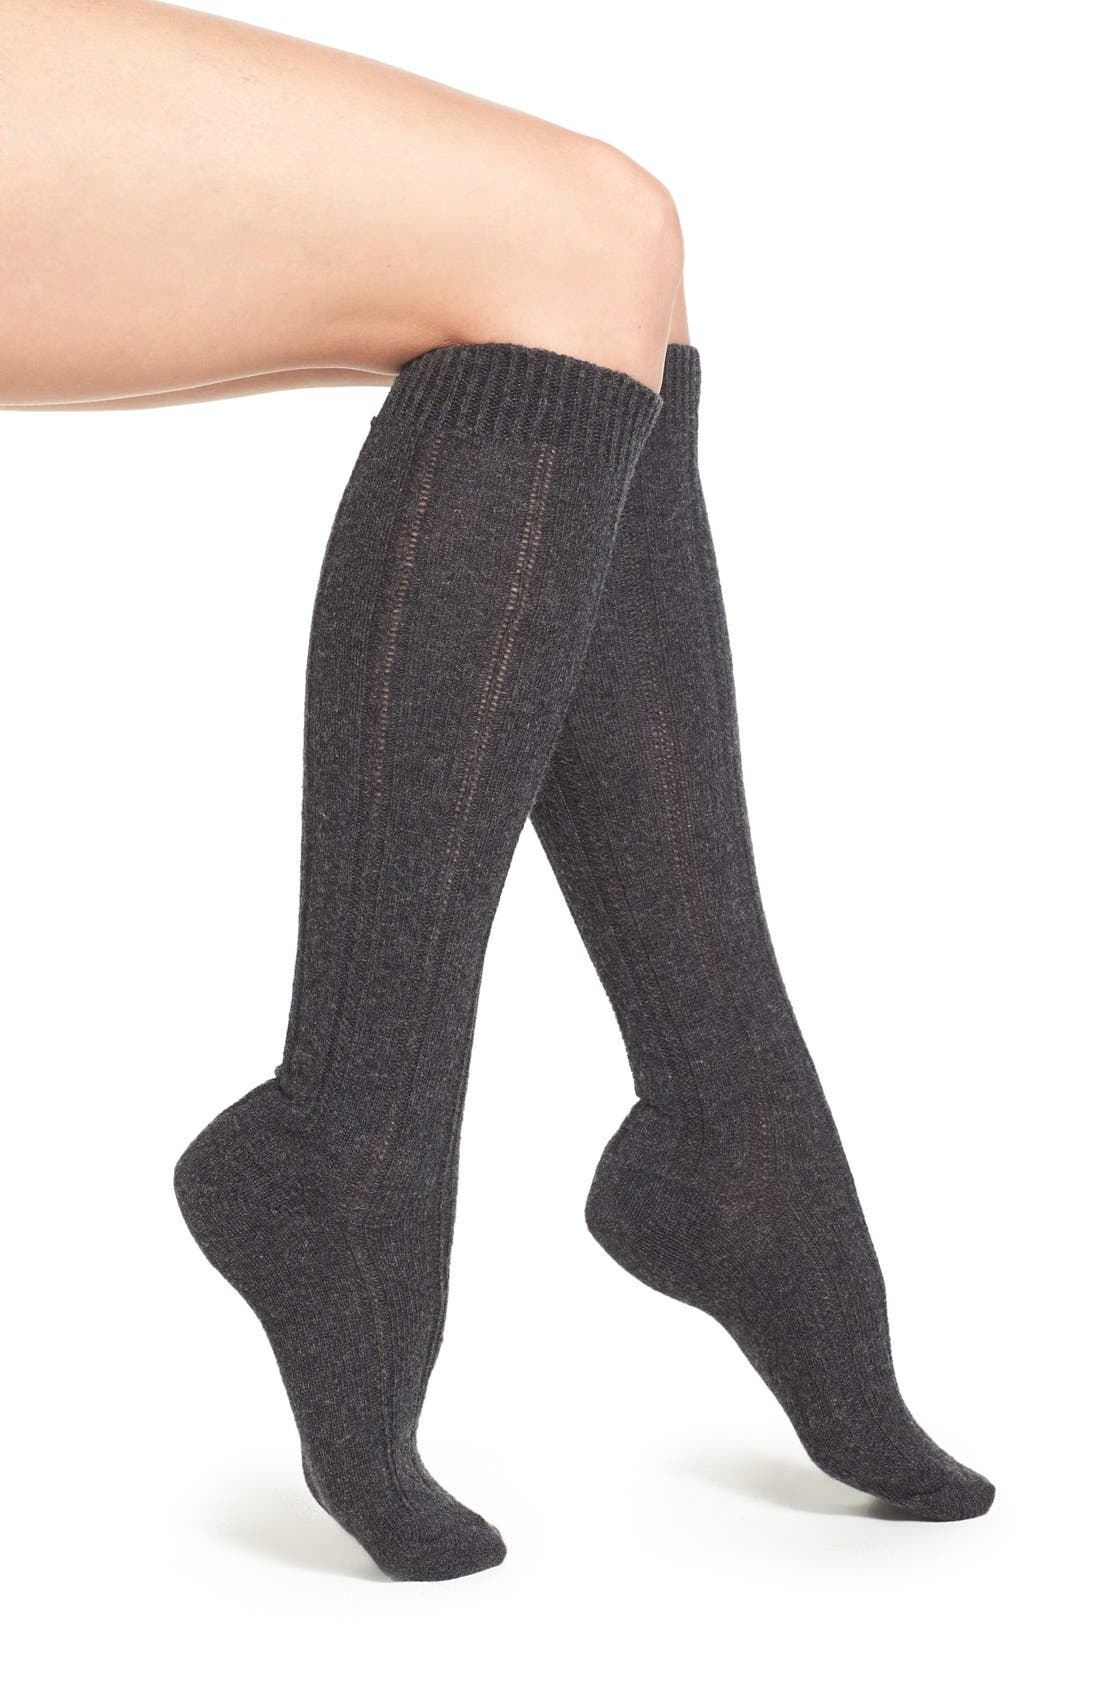 Alternate Image 1 Selected - B.ella Rib Cashmere Blend Knee Socks